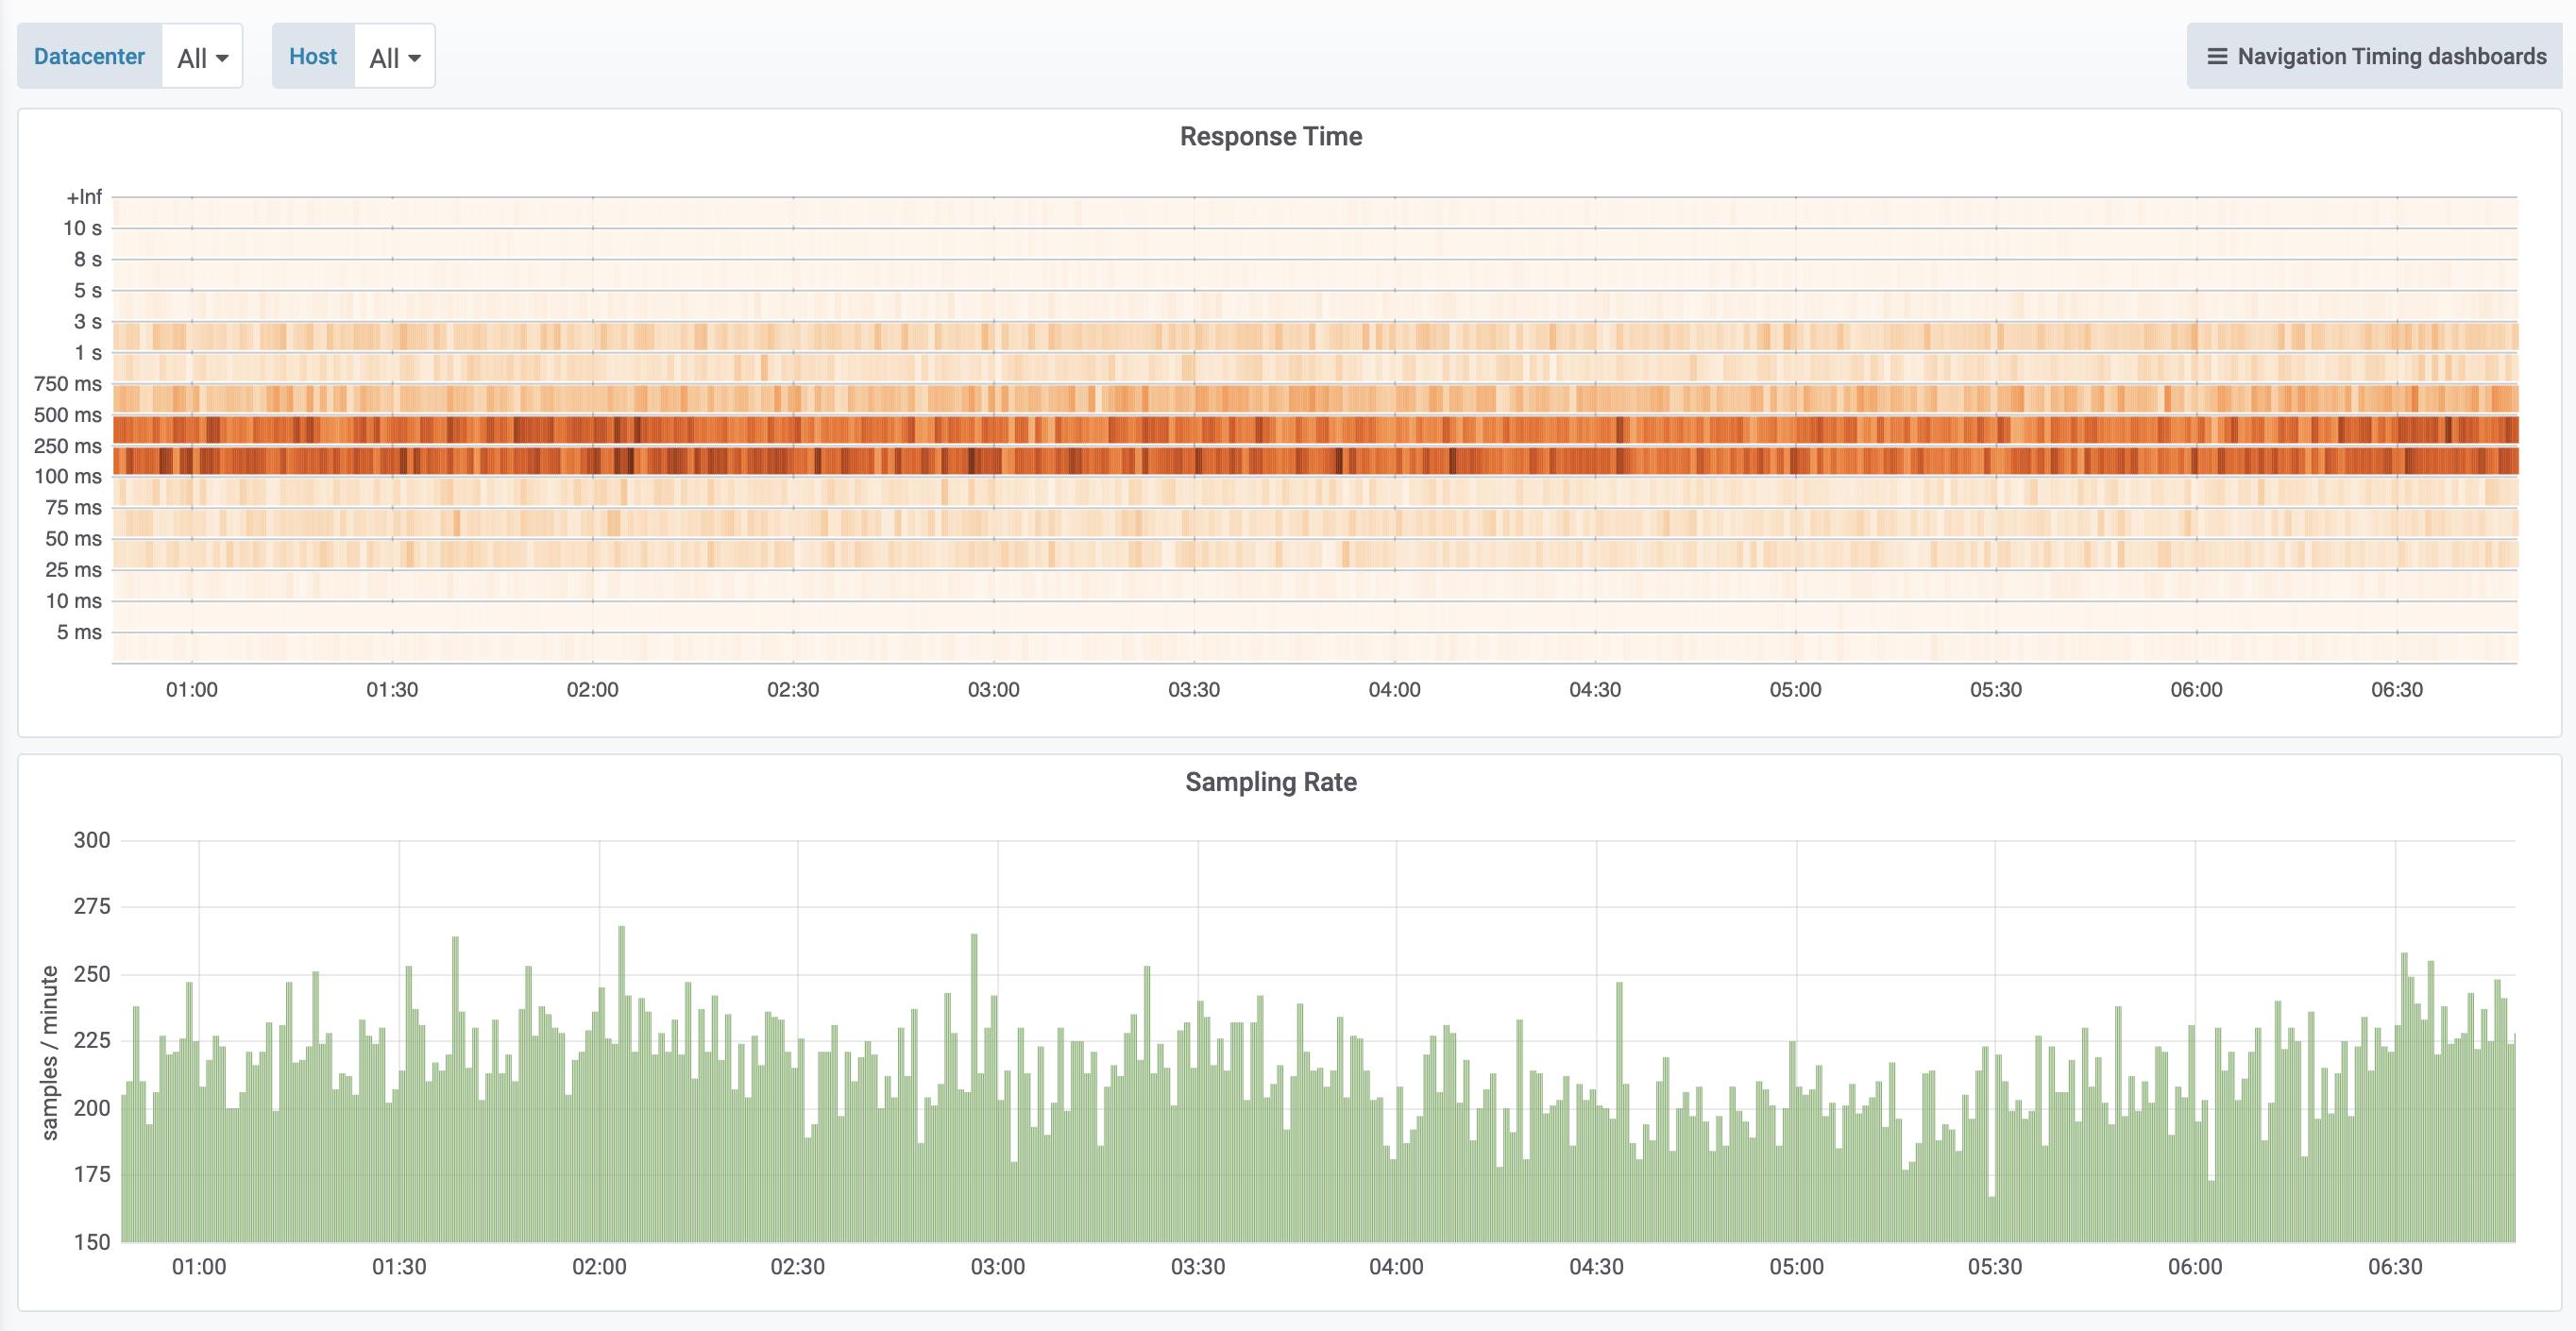 Screenshot 2020-05-15 at 08.48.12.png (1×2 px, 781 KB)